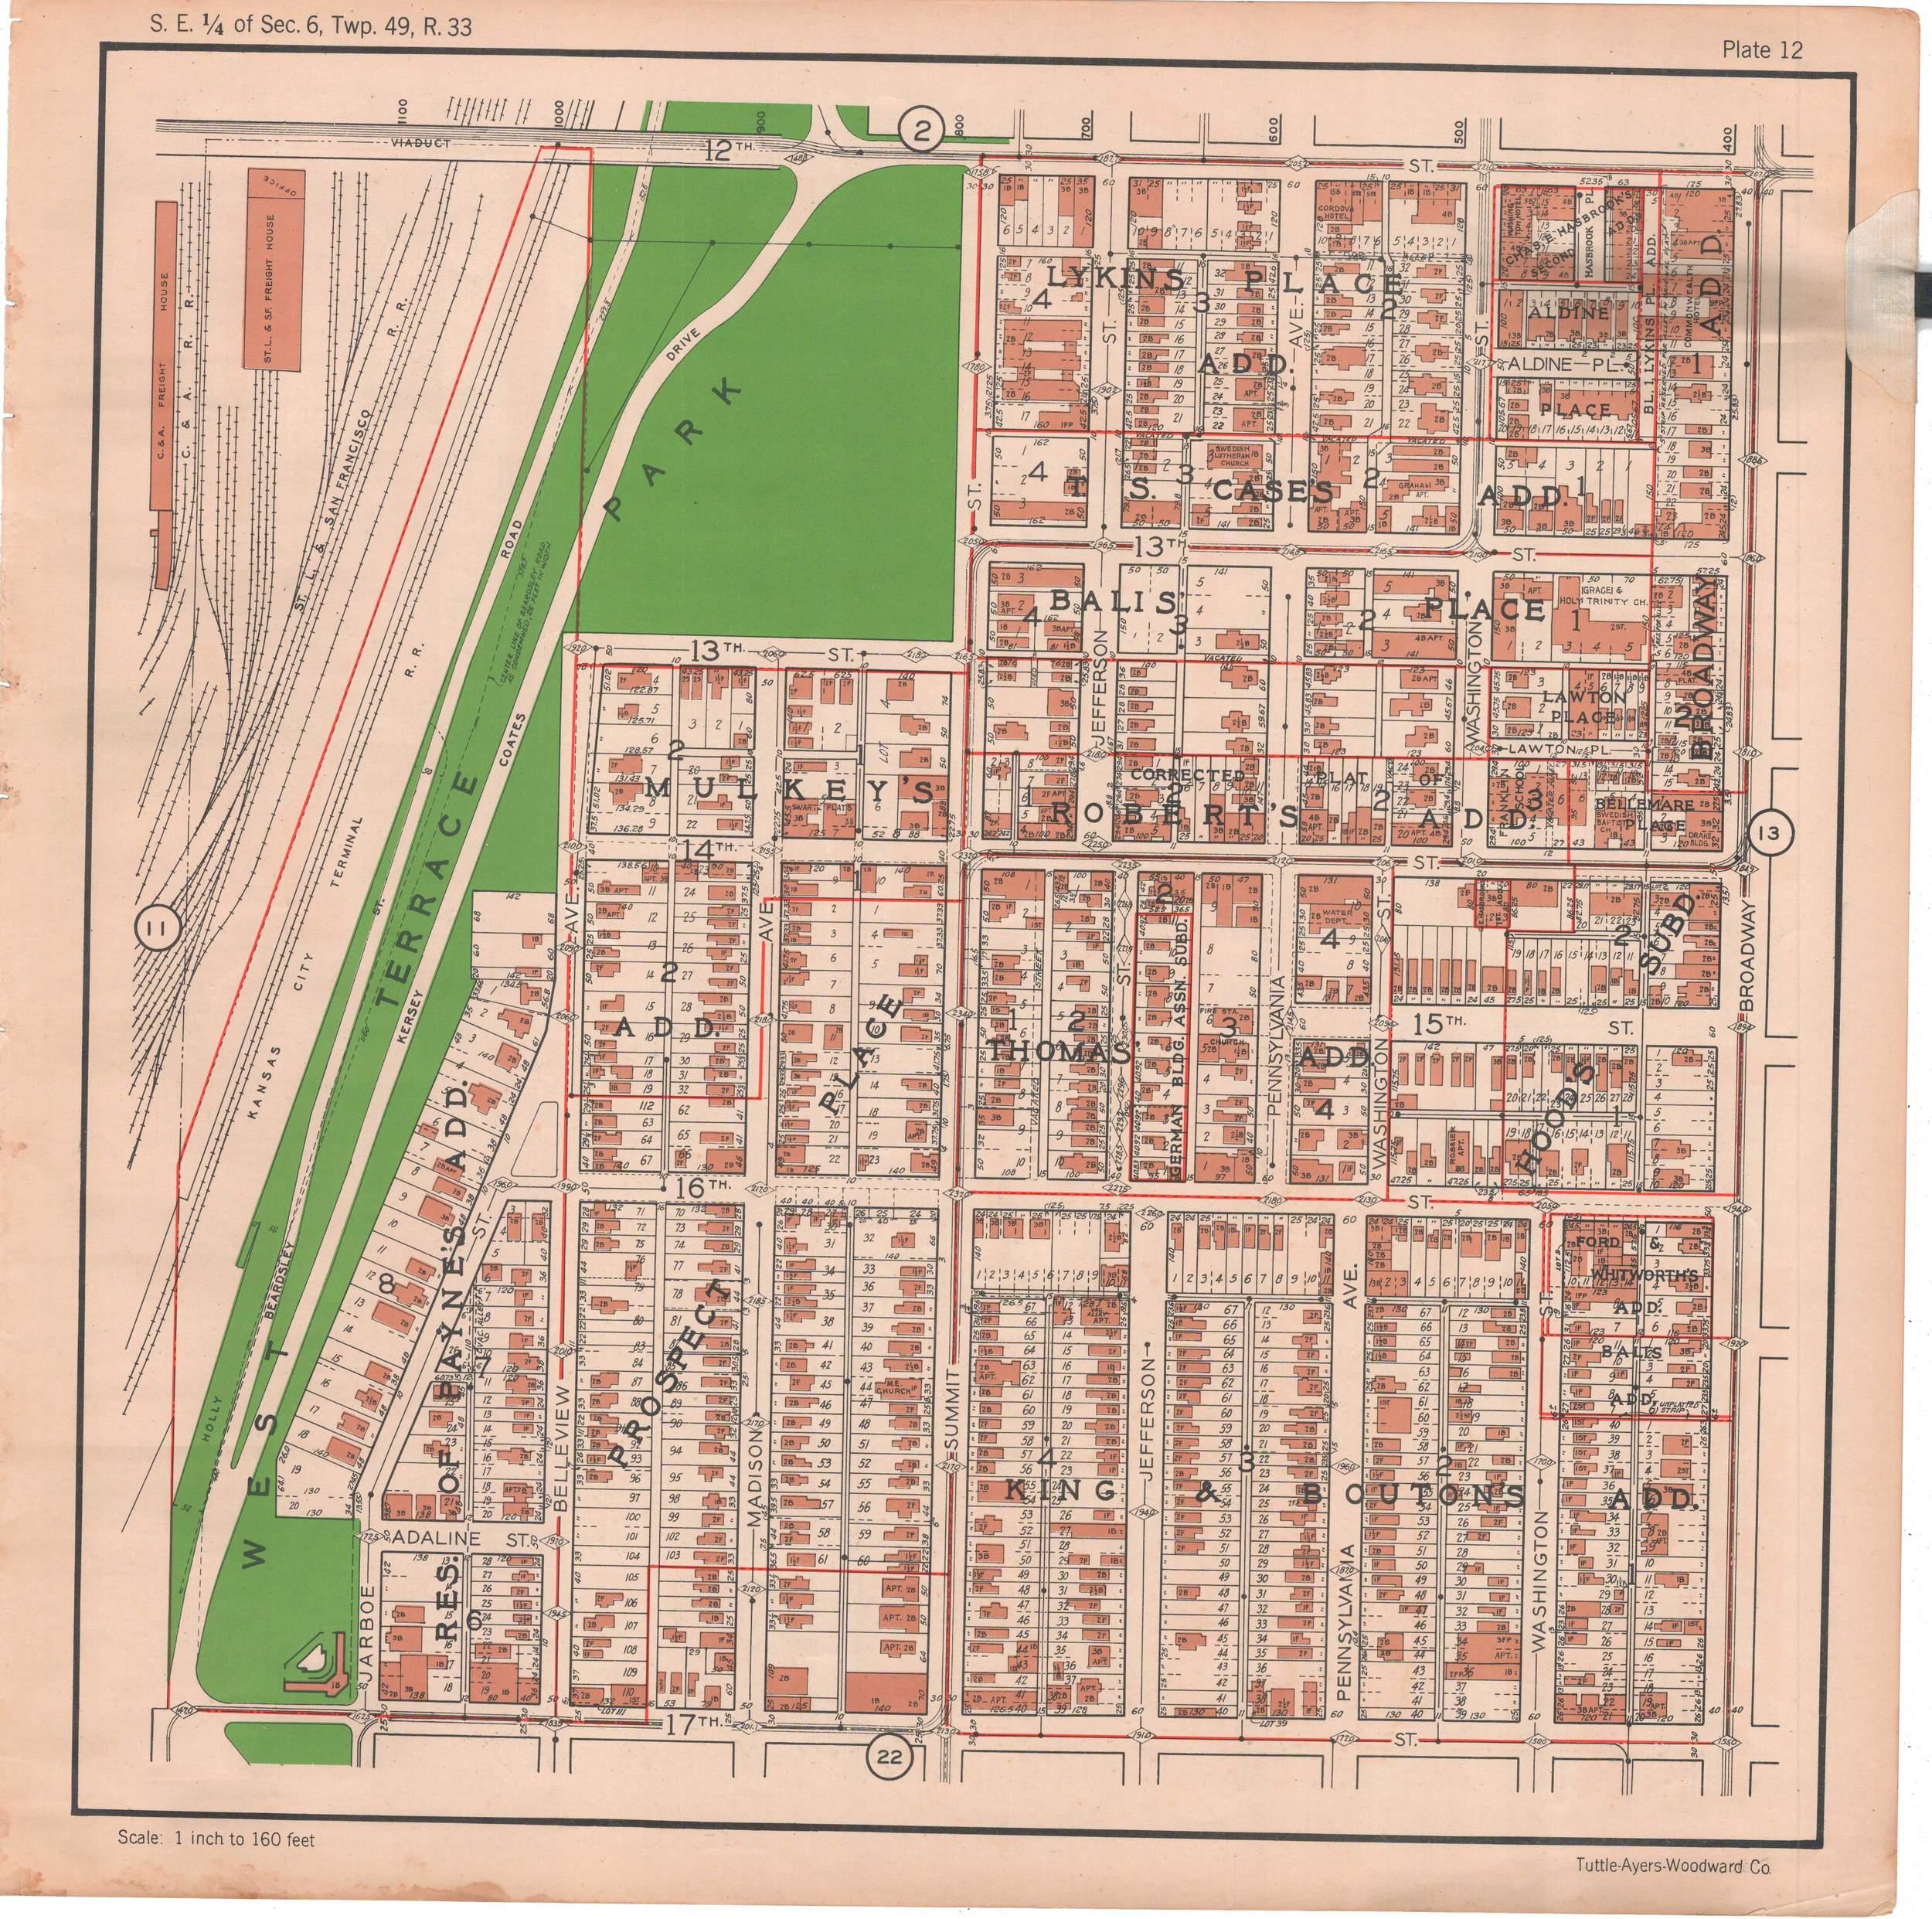 1925 TUTTLE_AYERS_Plate 12.JPG